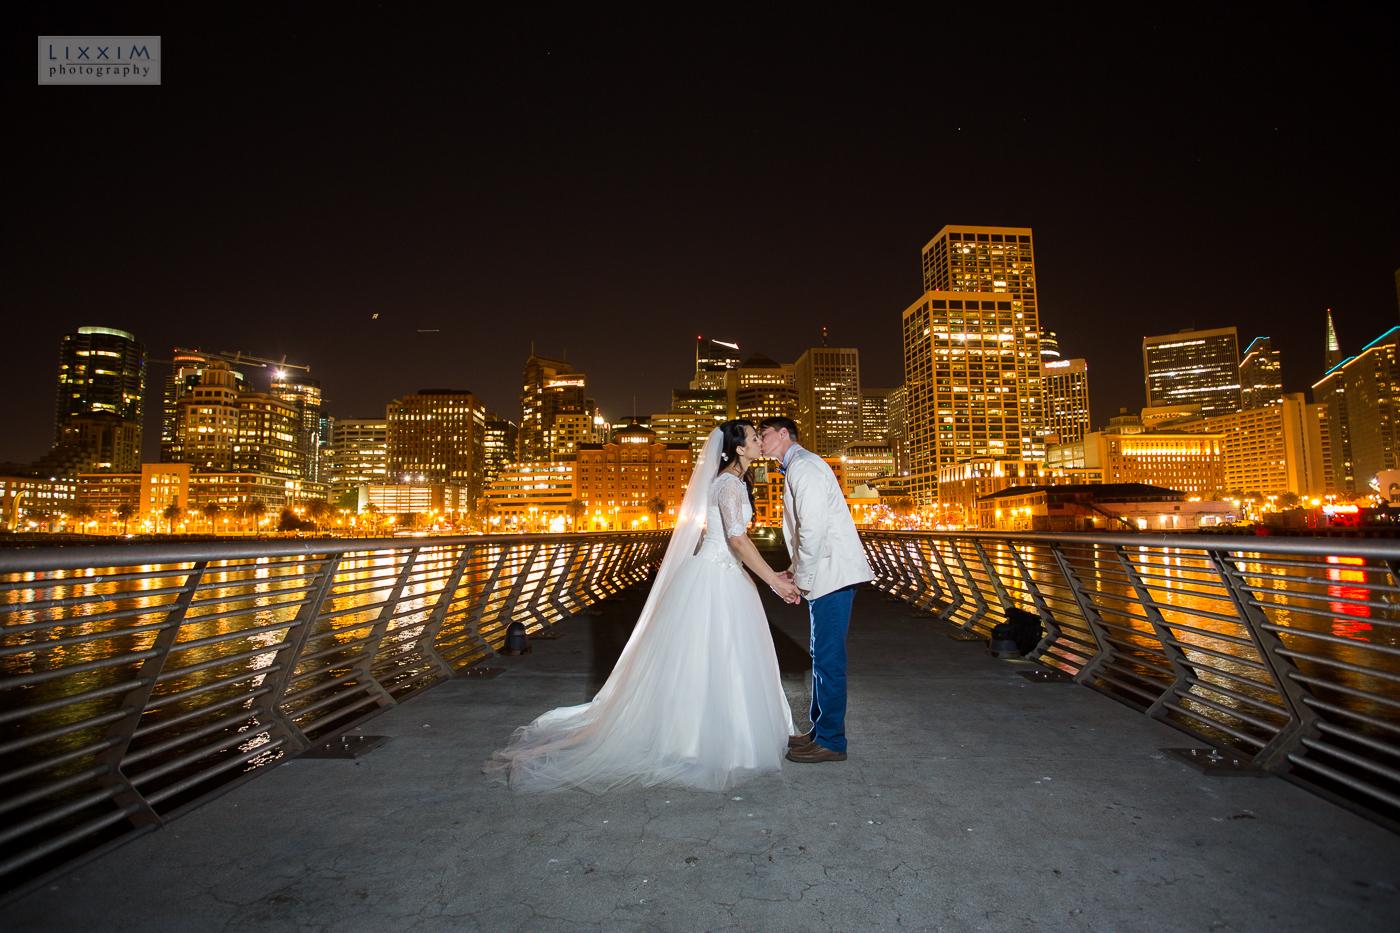 night-wedding-photography-san-francisco-sacramento-lixxim